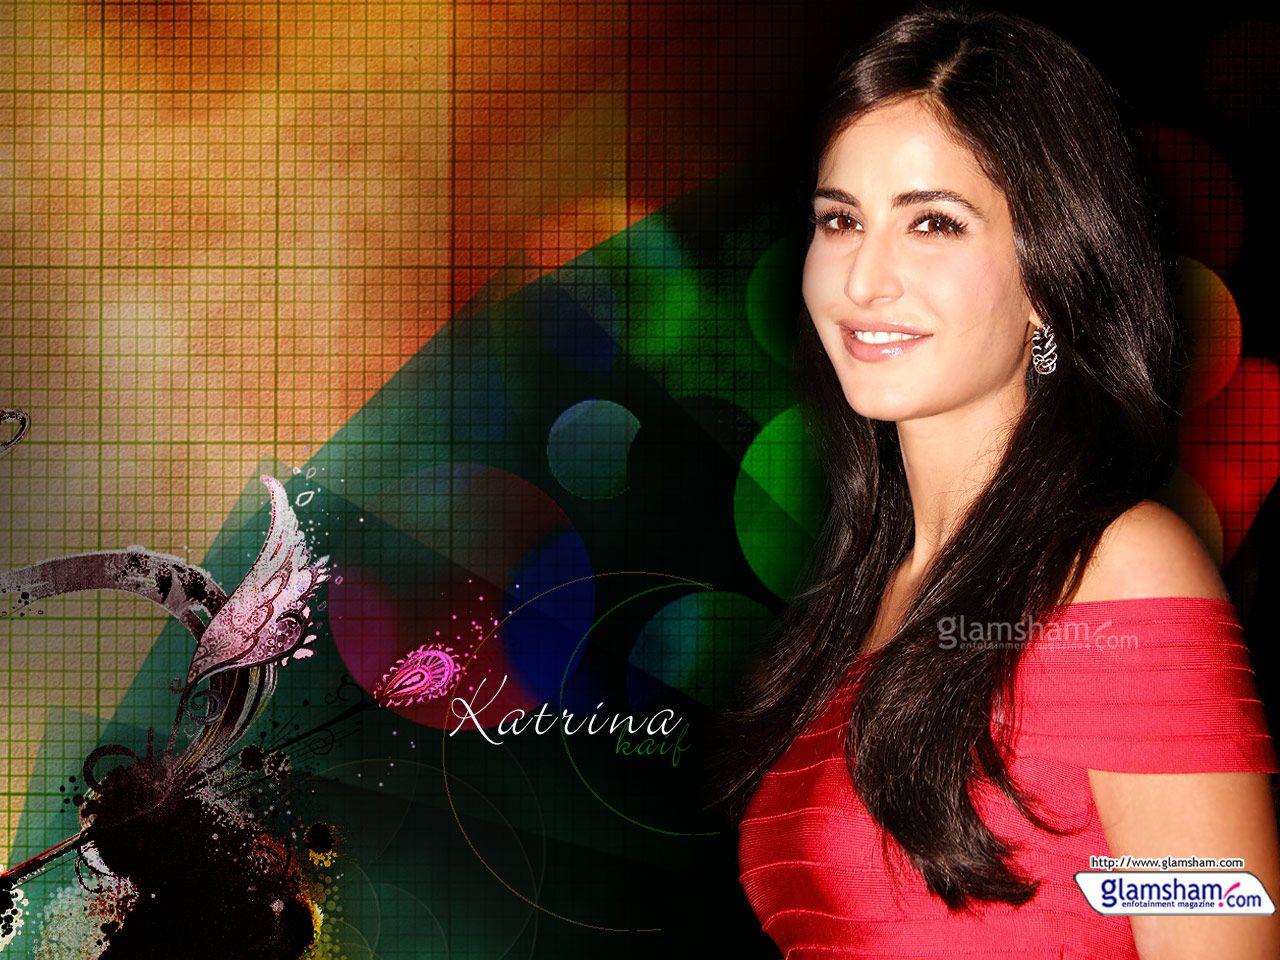 Download katrina kaif desktop wallpaer - Beautiful Wallpapers Of Katrina Kaif 1280 960 Katrina Images Wallpapers 61 Wallpapers